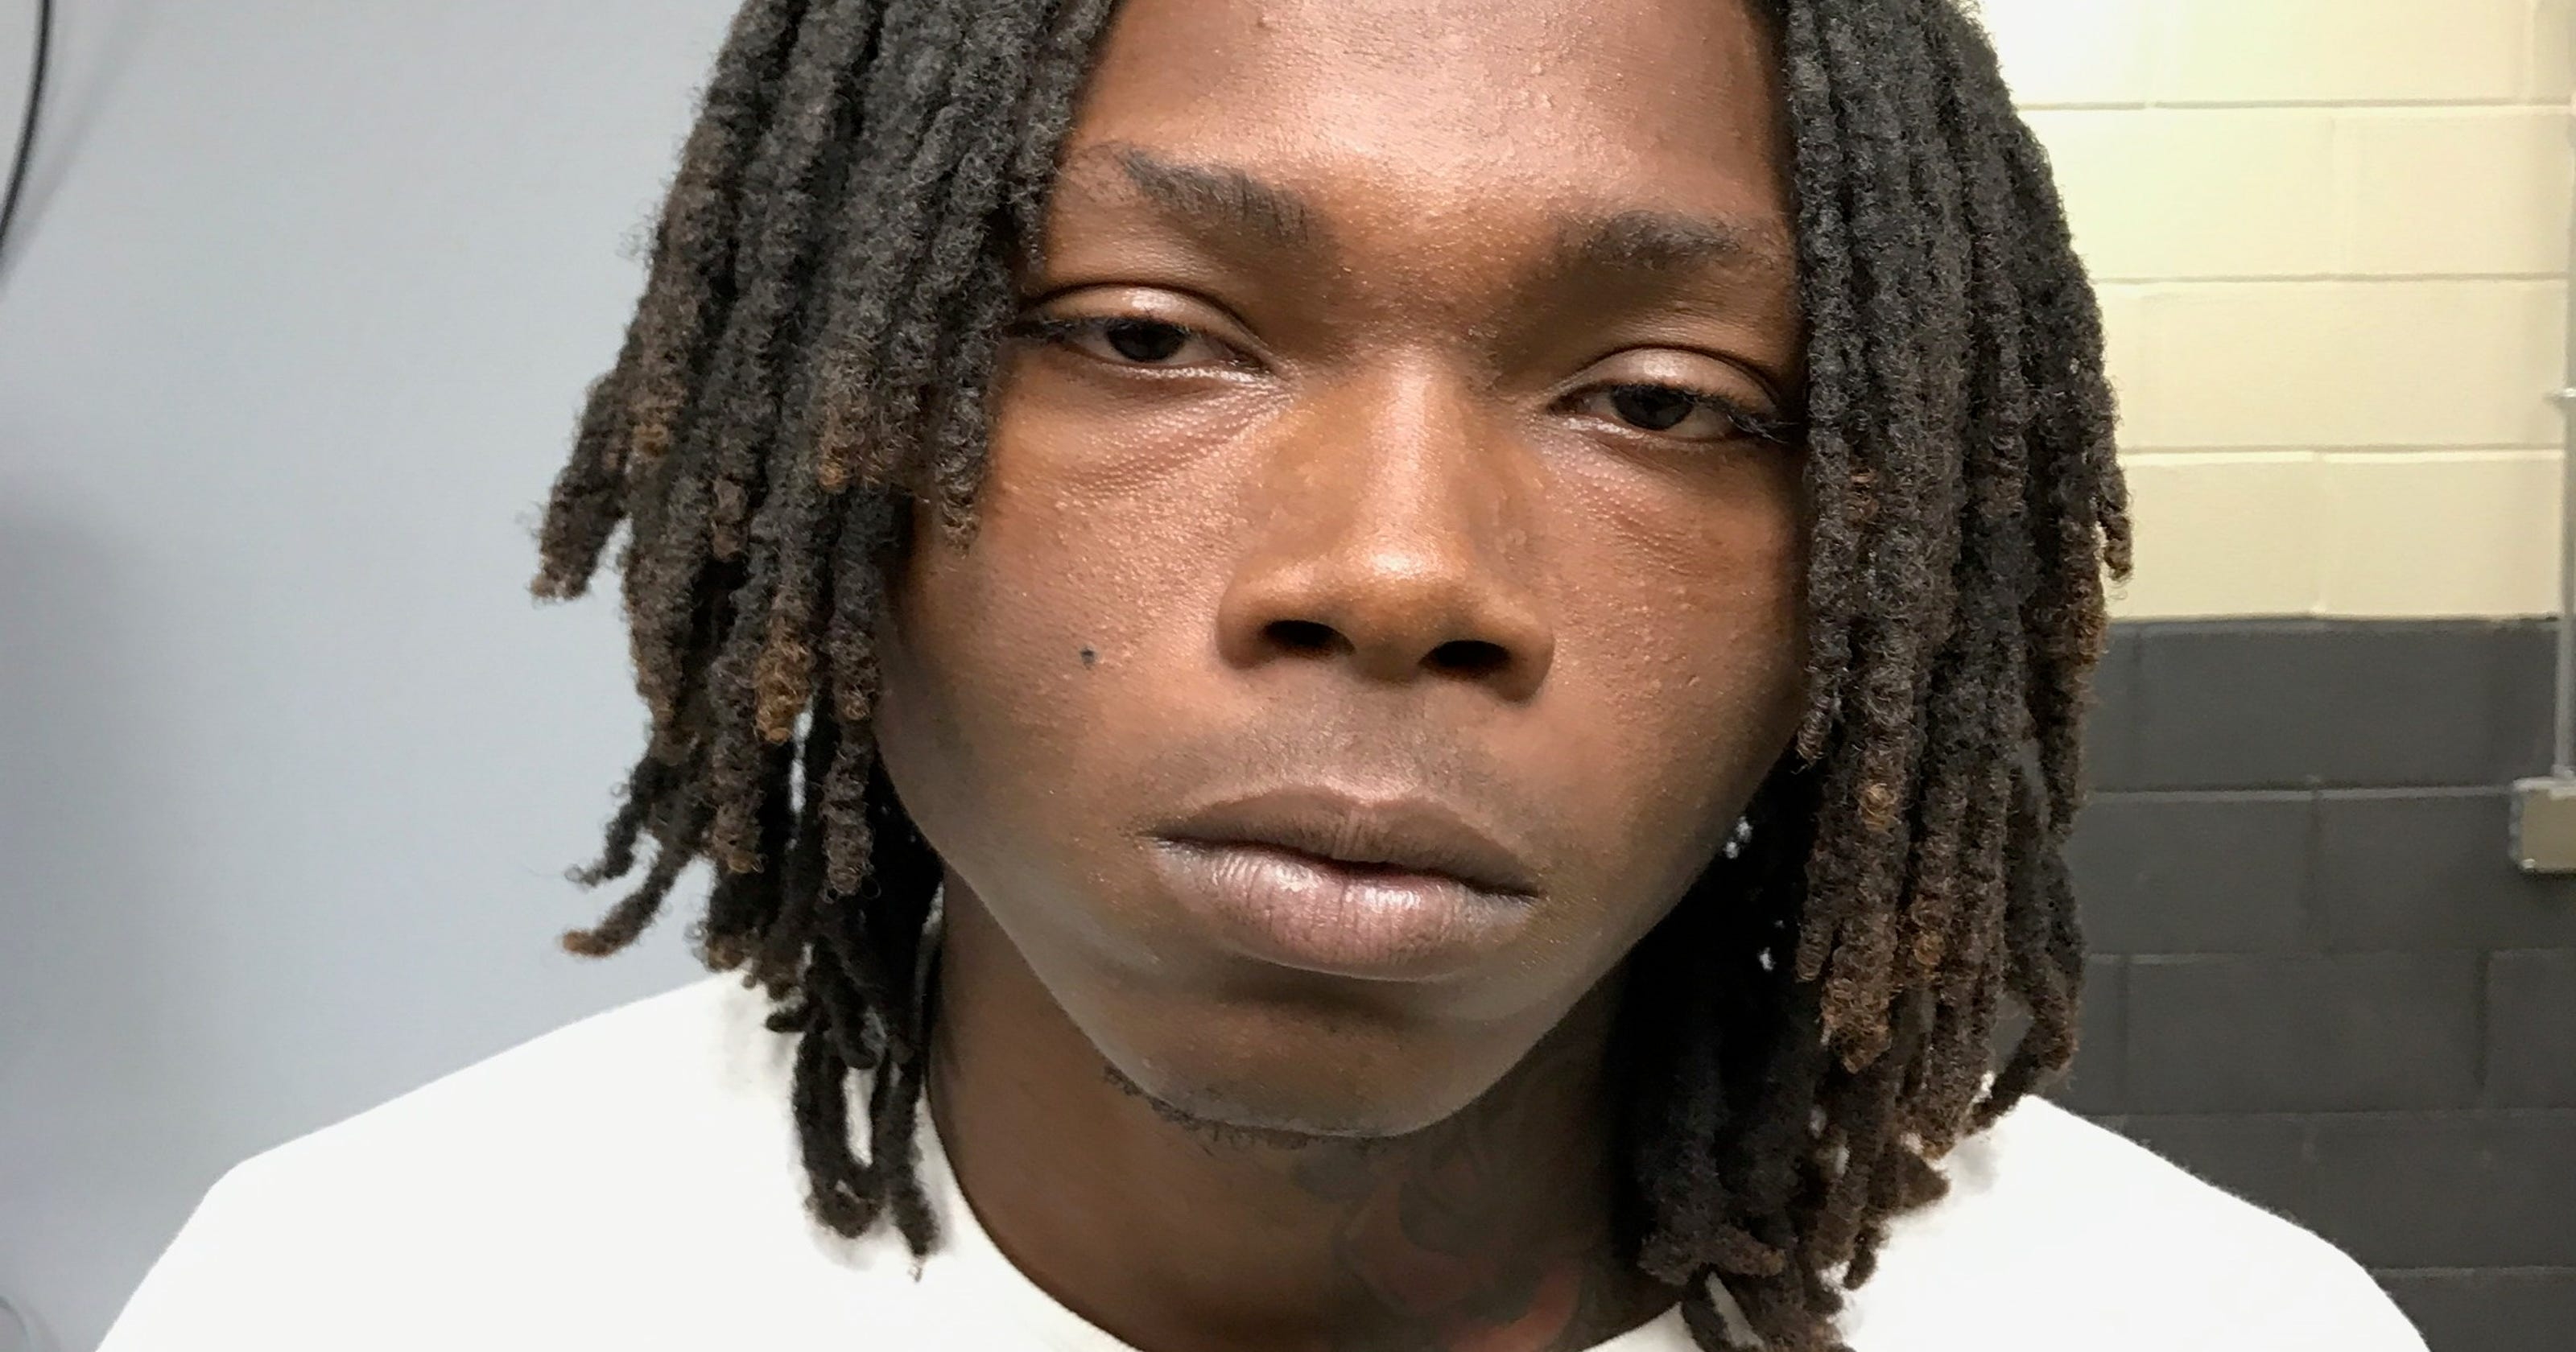 Update: Mississippi murder suspect arrested in Bastrop